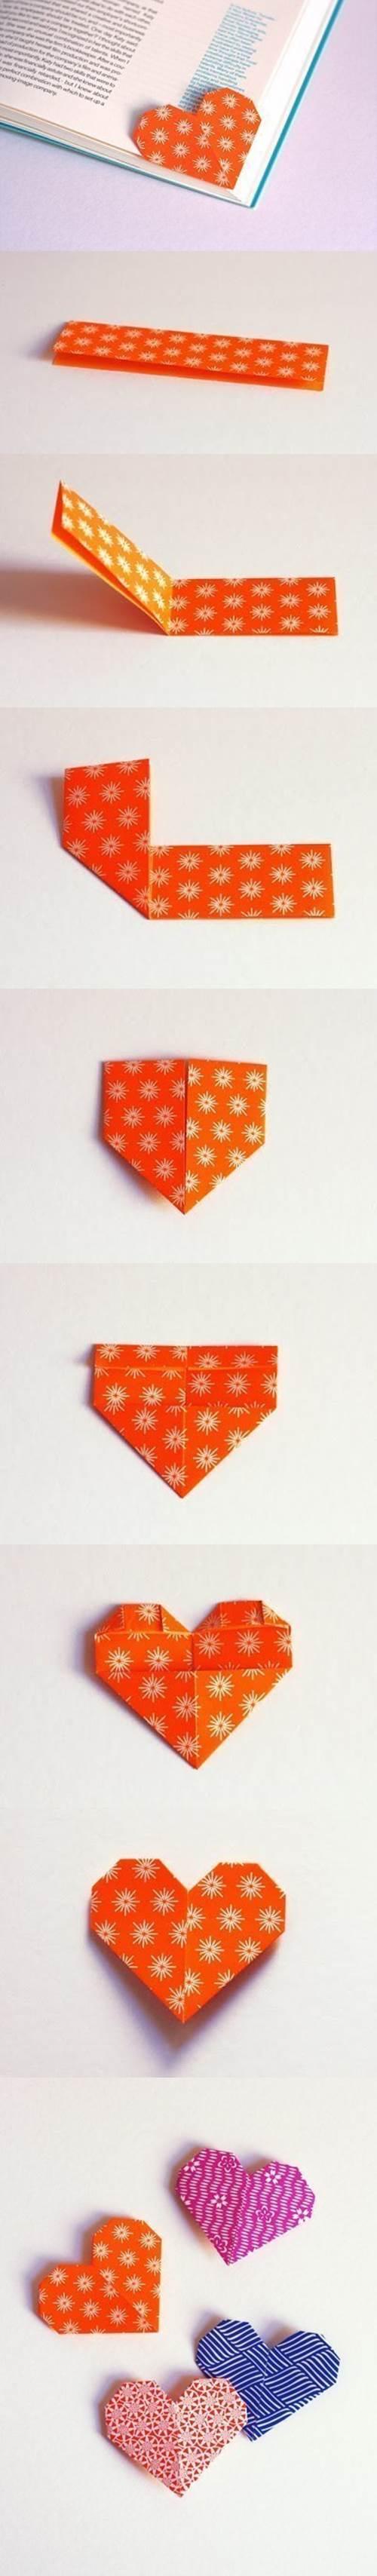 DIY Cute Origami Heart Shaped Bookmark | iCreativeIdeas.com Like Us on Facebook == https://www.facebook.com/icreativeideas